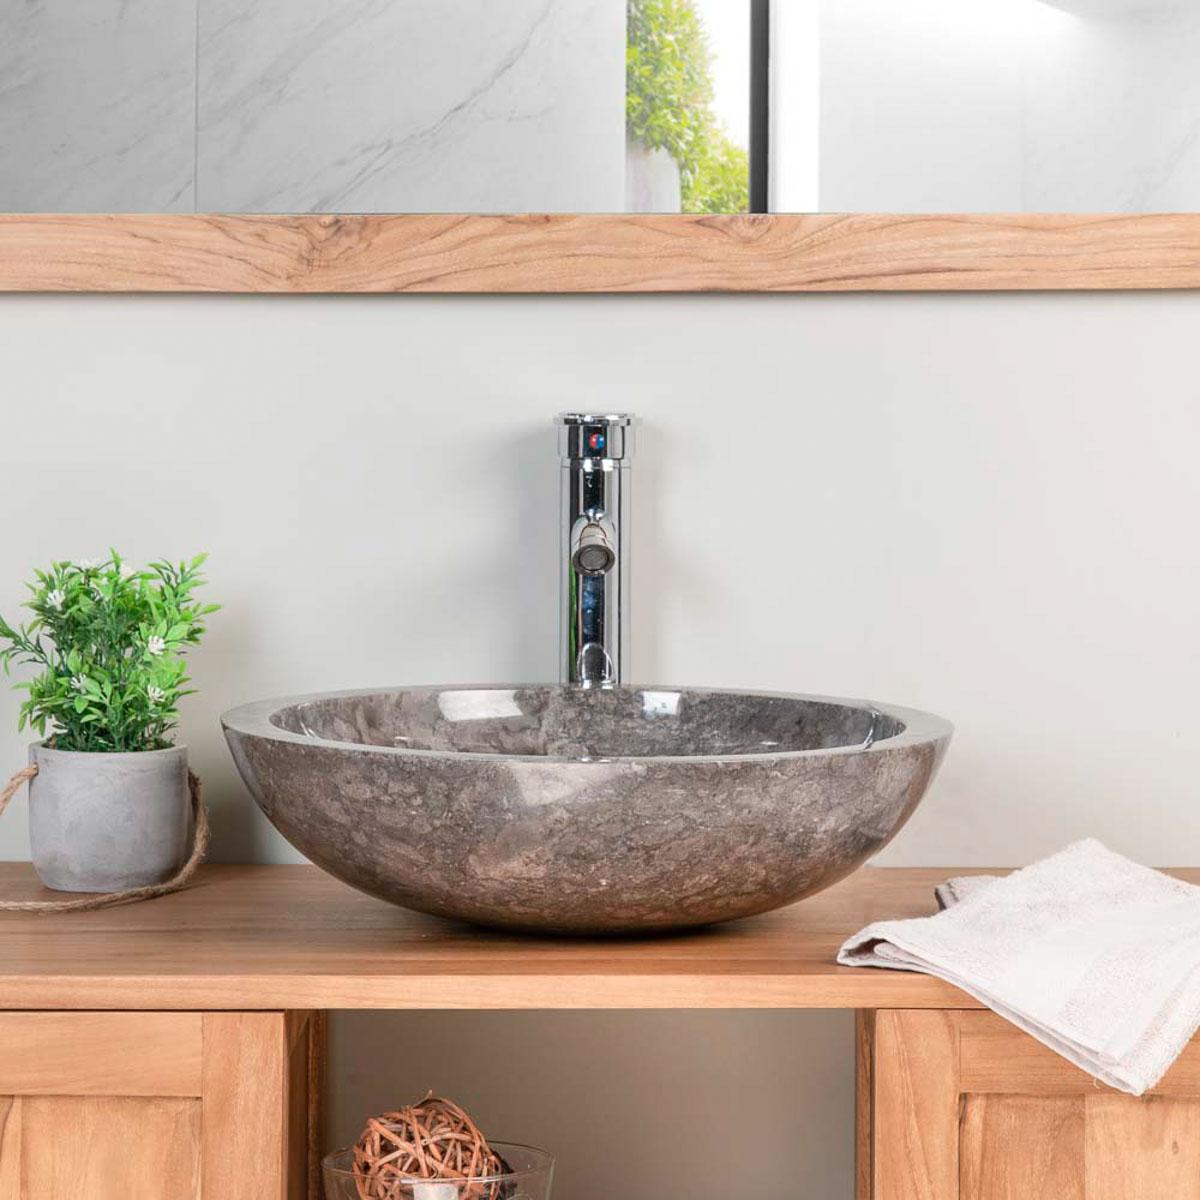 Lavabo encimera redondo barcelona de m rmol gris 45cm for Lavabo marmol